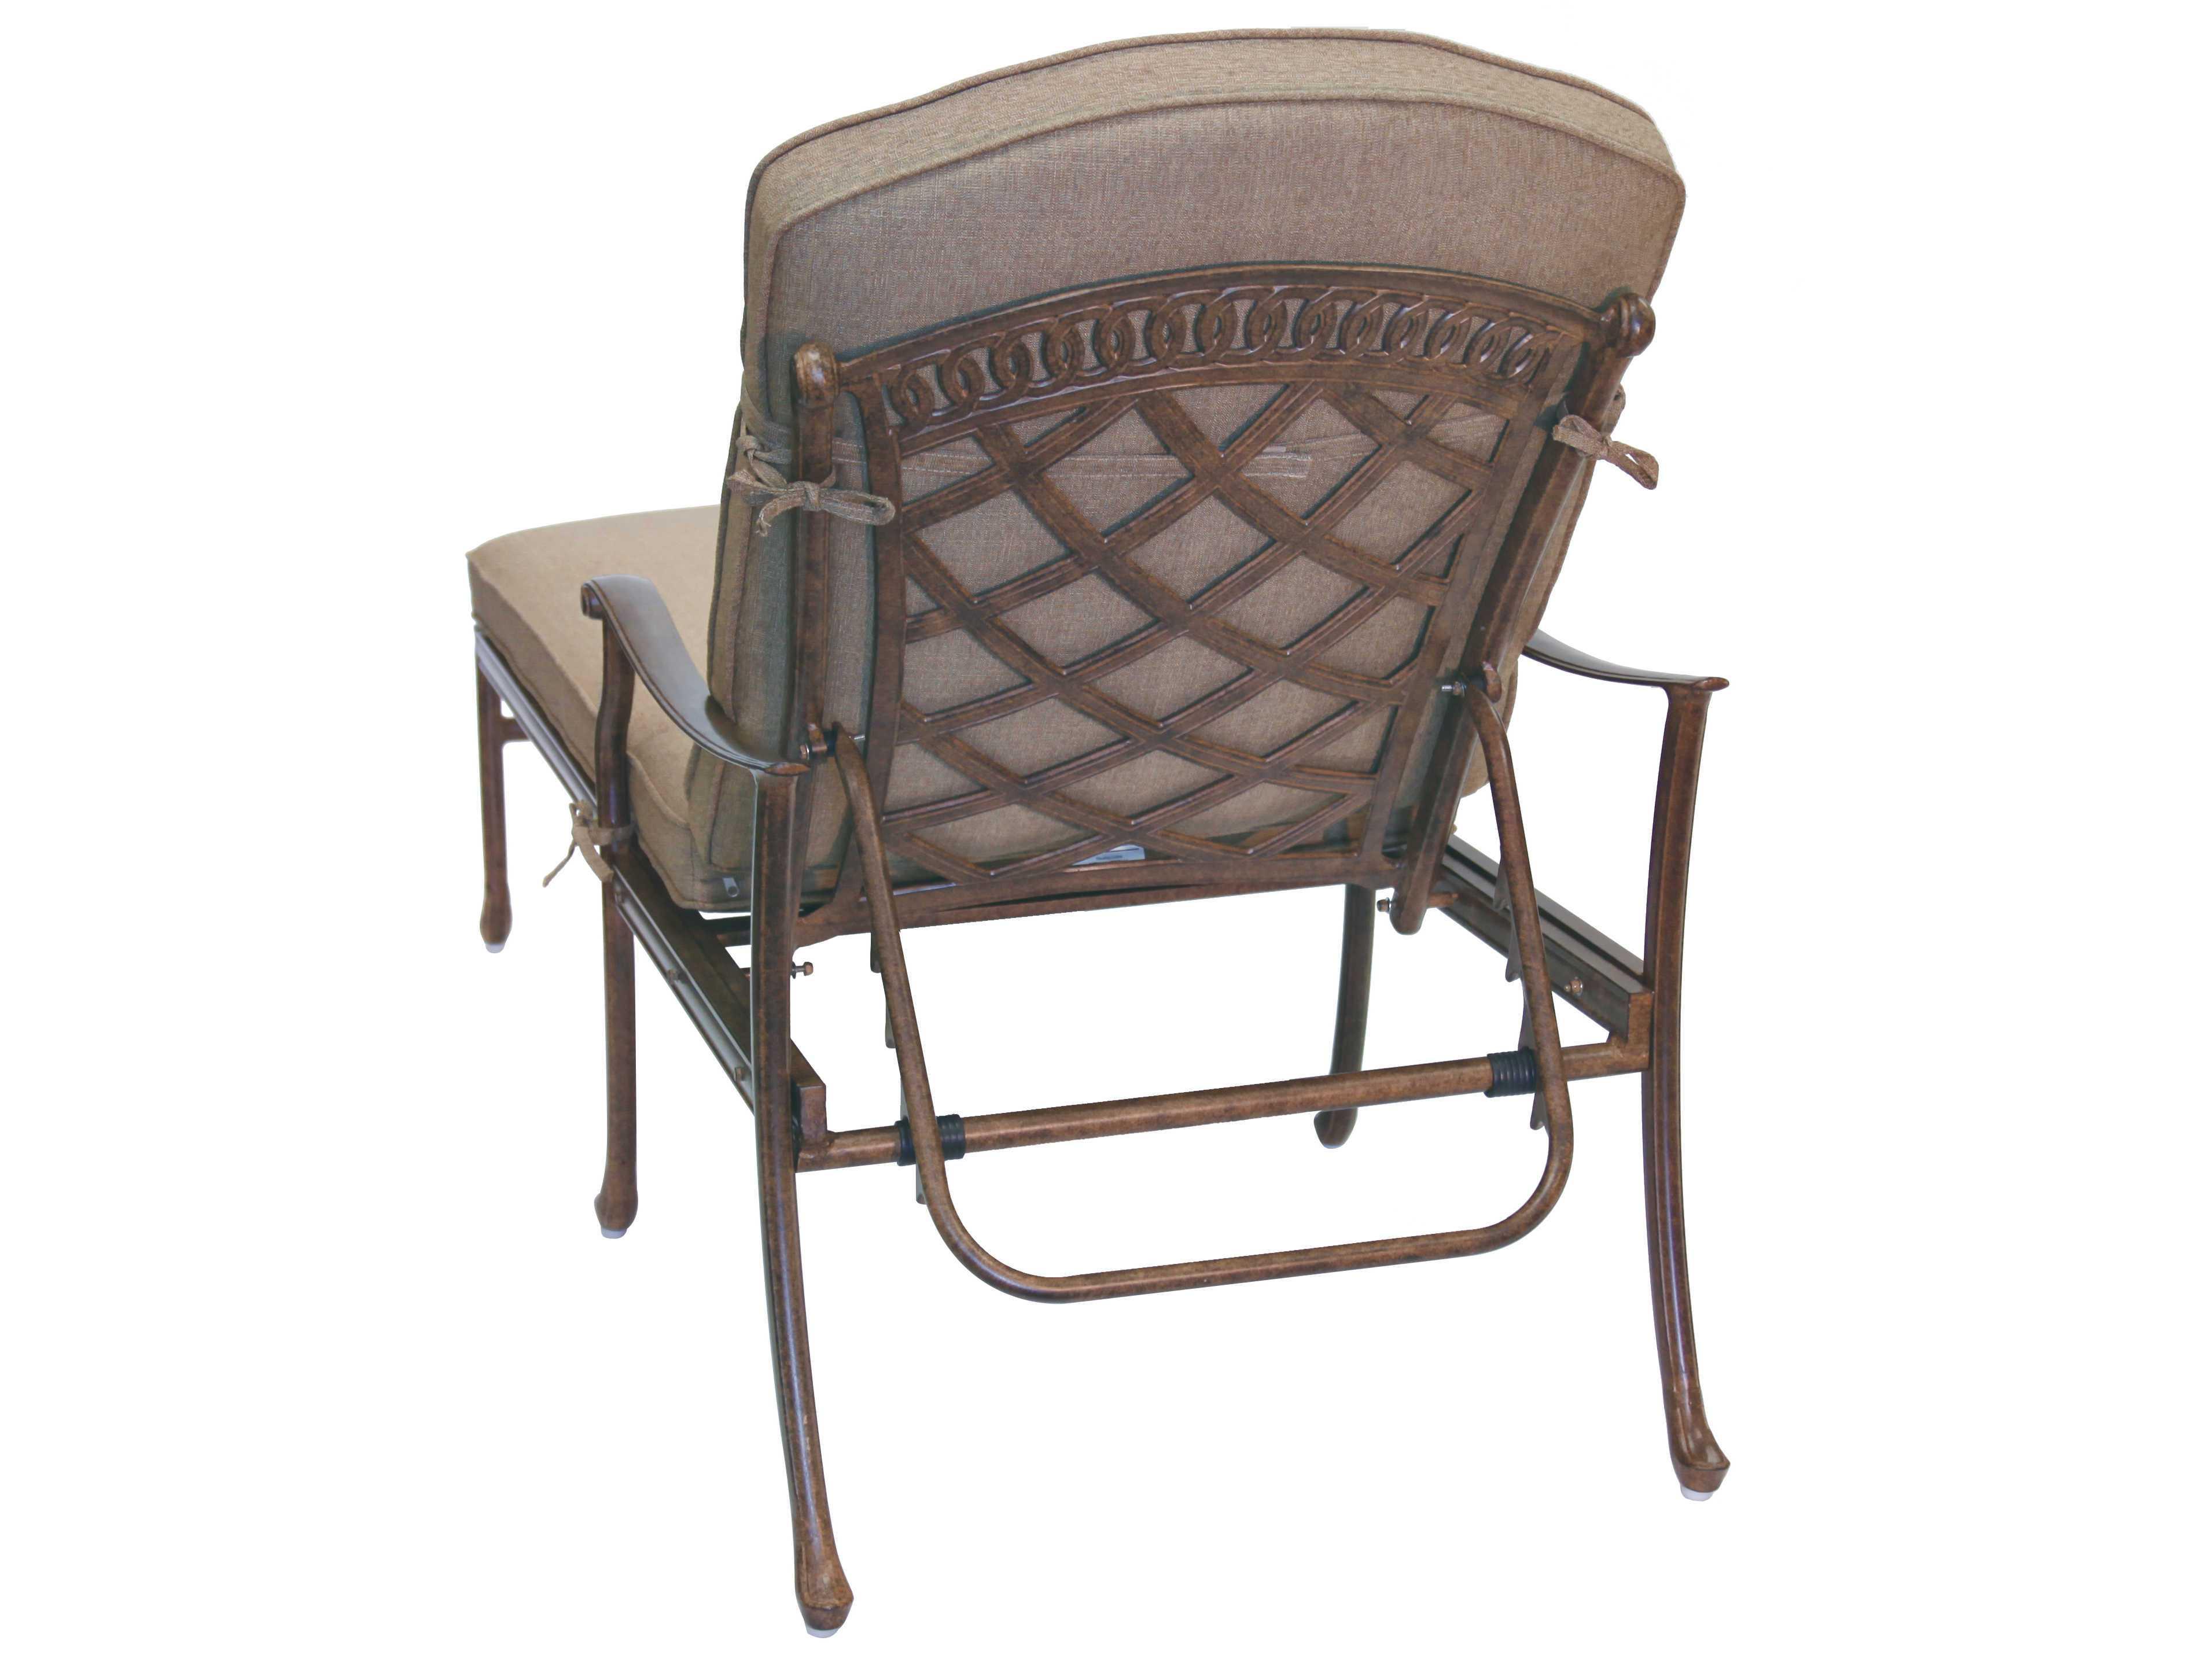 Darlee outdoor living sedona cast aluminum chaise lounge for Cast aluminum chaise lounge